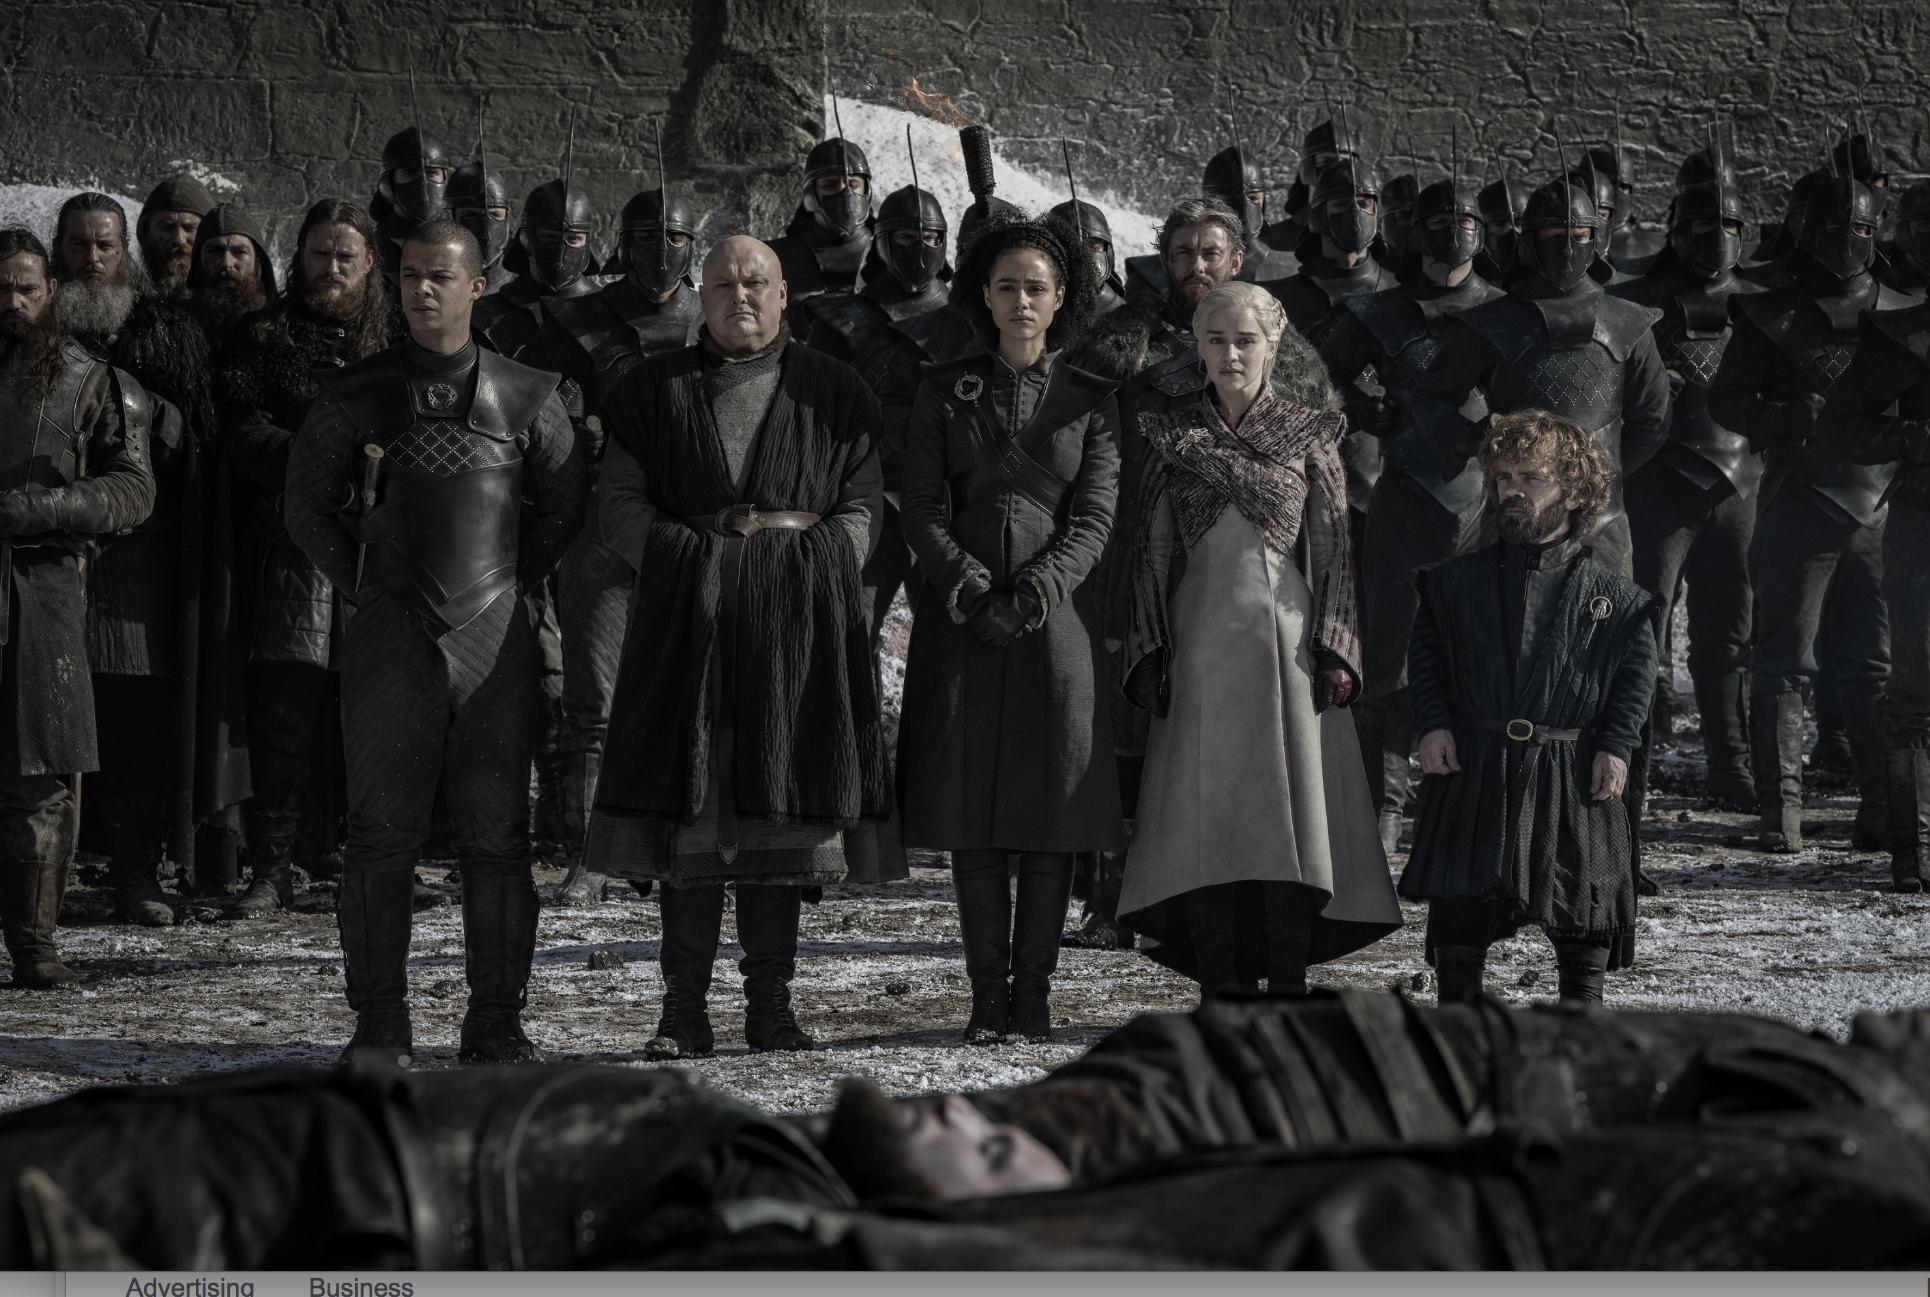 Game of Thrones season 8, episode 4: Grey Worm, Varys, Daenerys Targarye and Tyrion Lannister